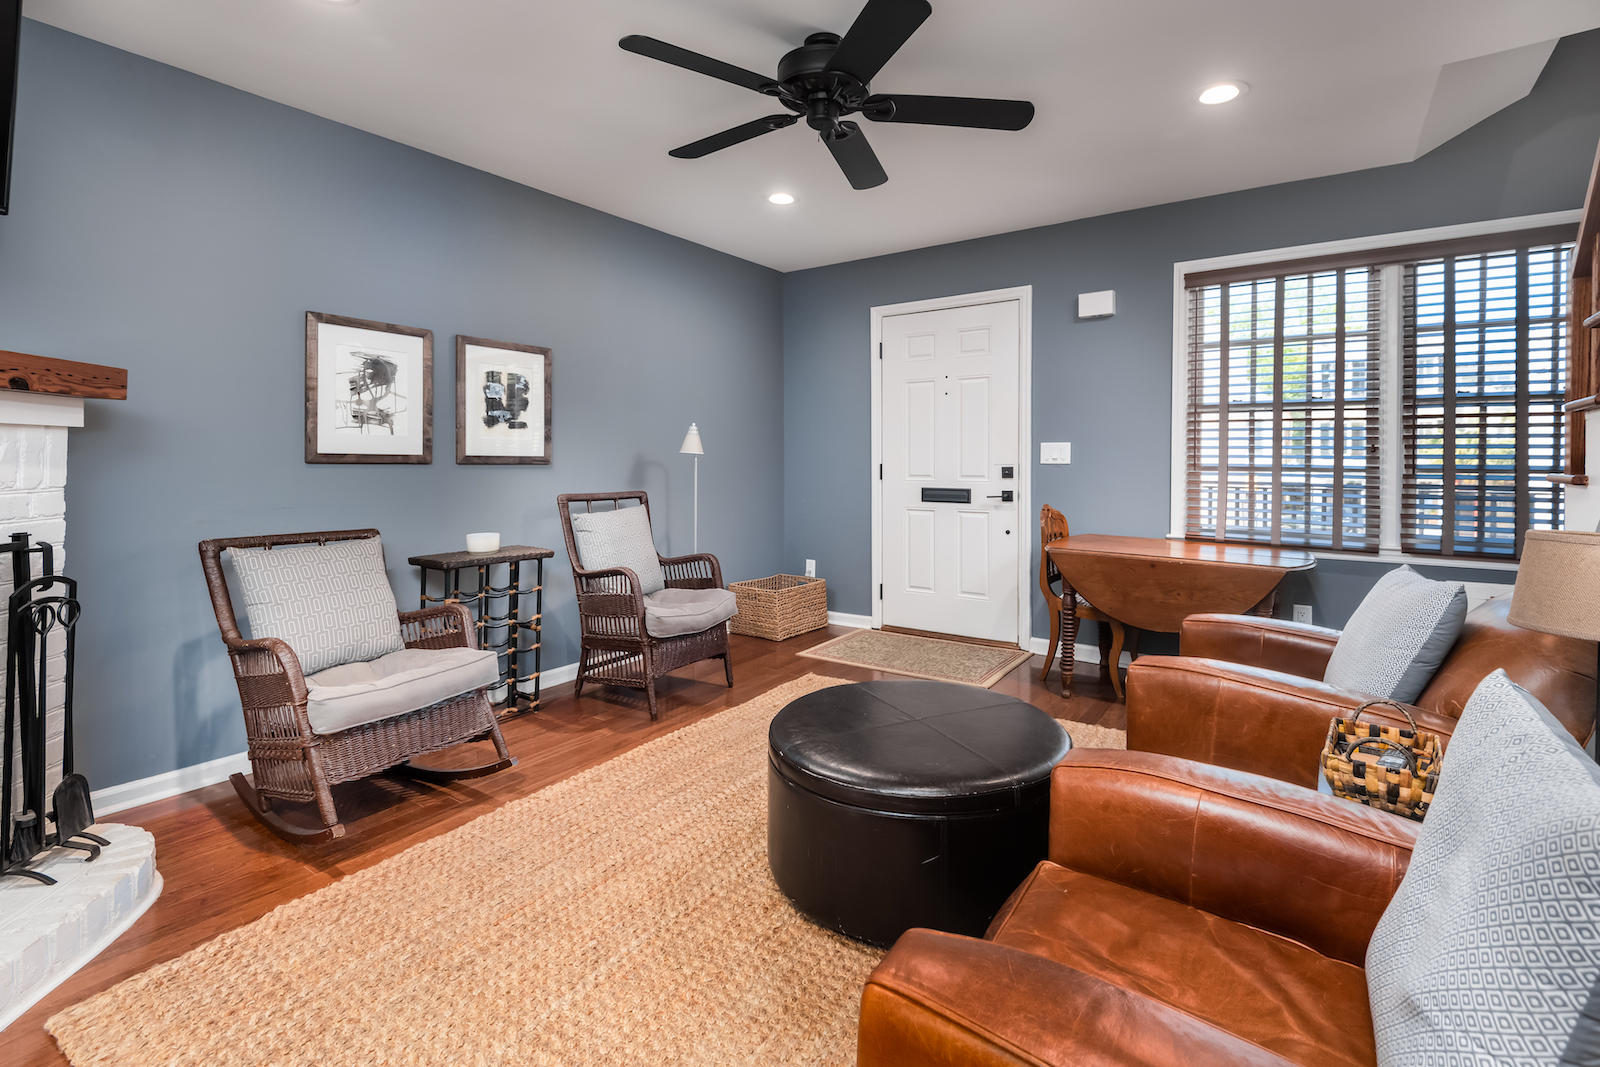 Harleston Village Homes For Sale - 15 Horlbeck, Charleston, SC - 3